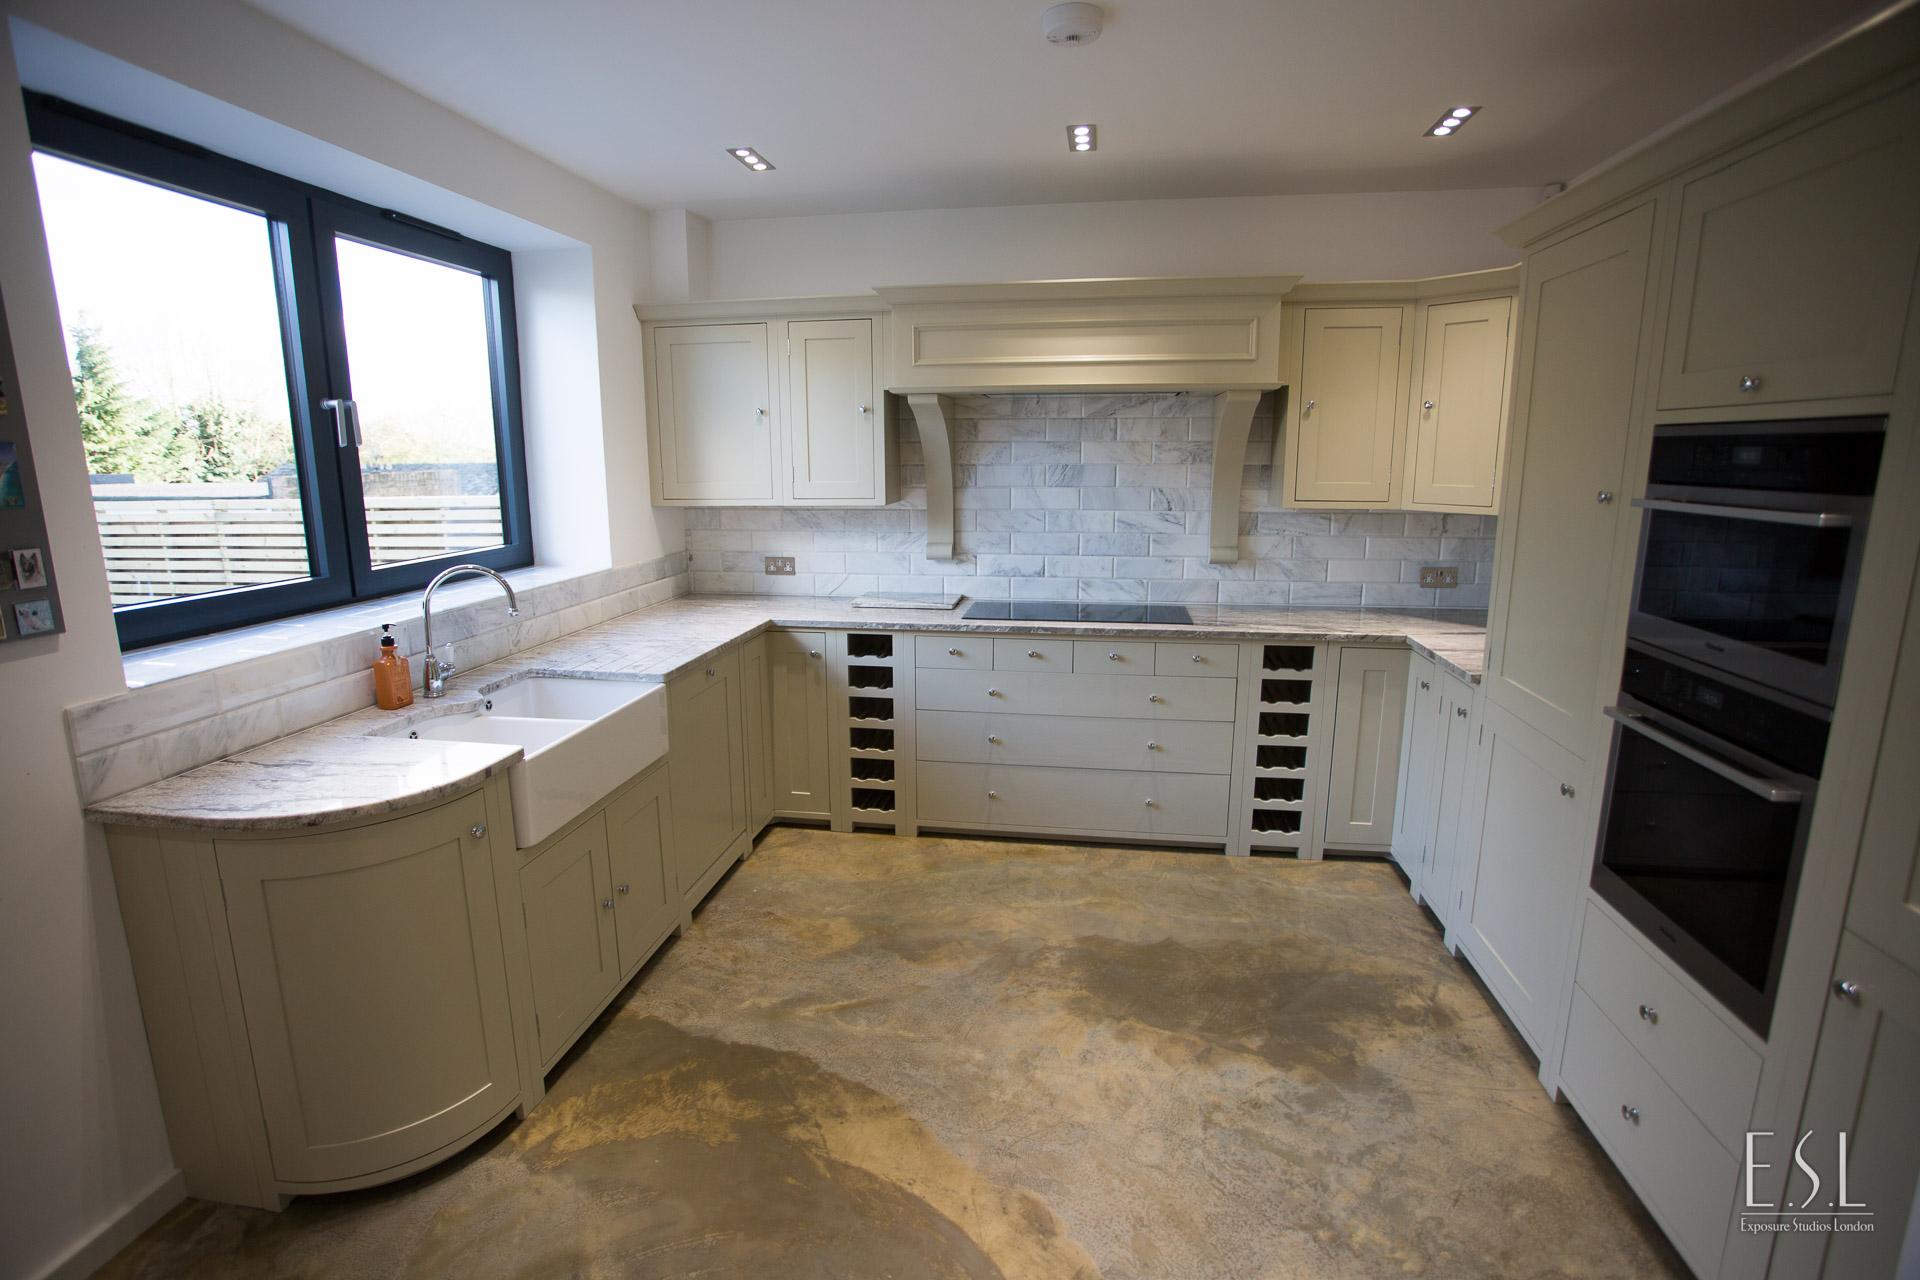 Builders, Winchmore Hill, London House rennovation & Refurbishment 02